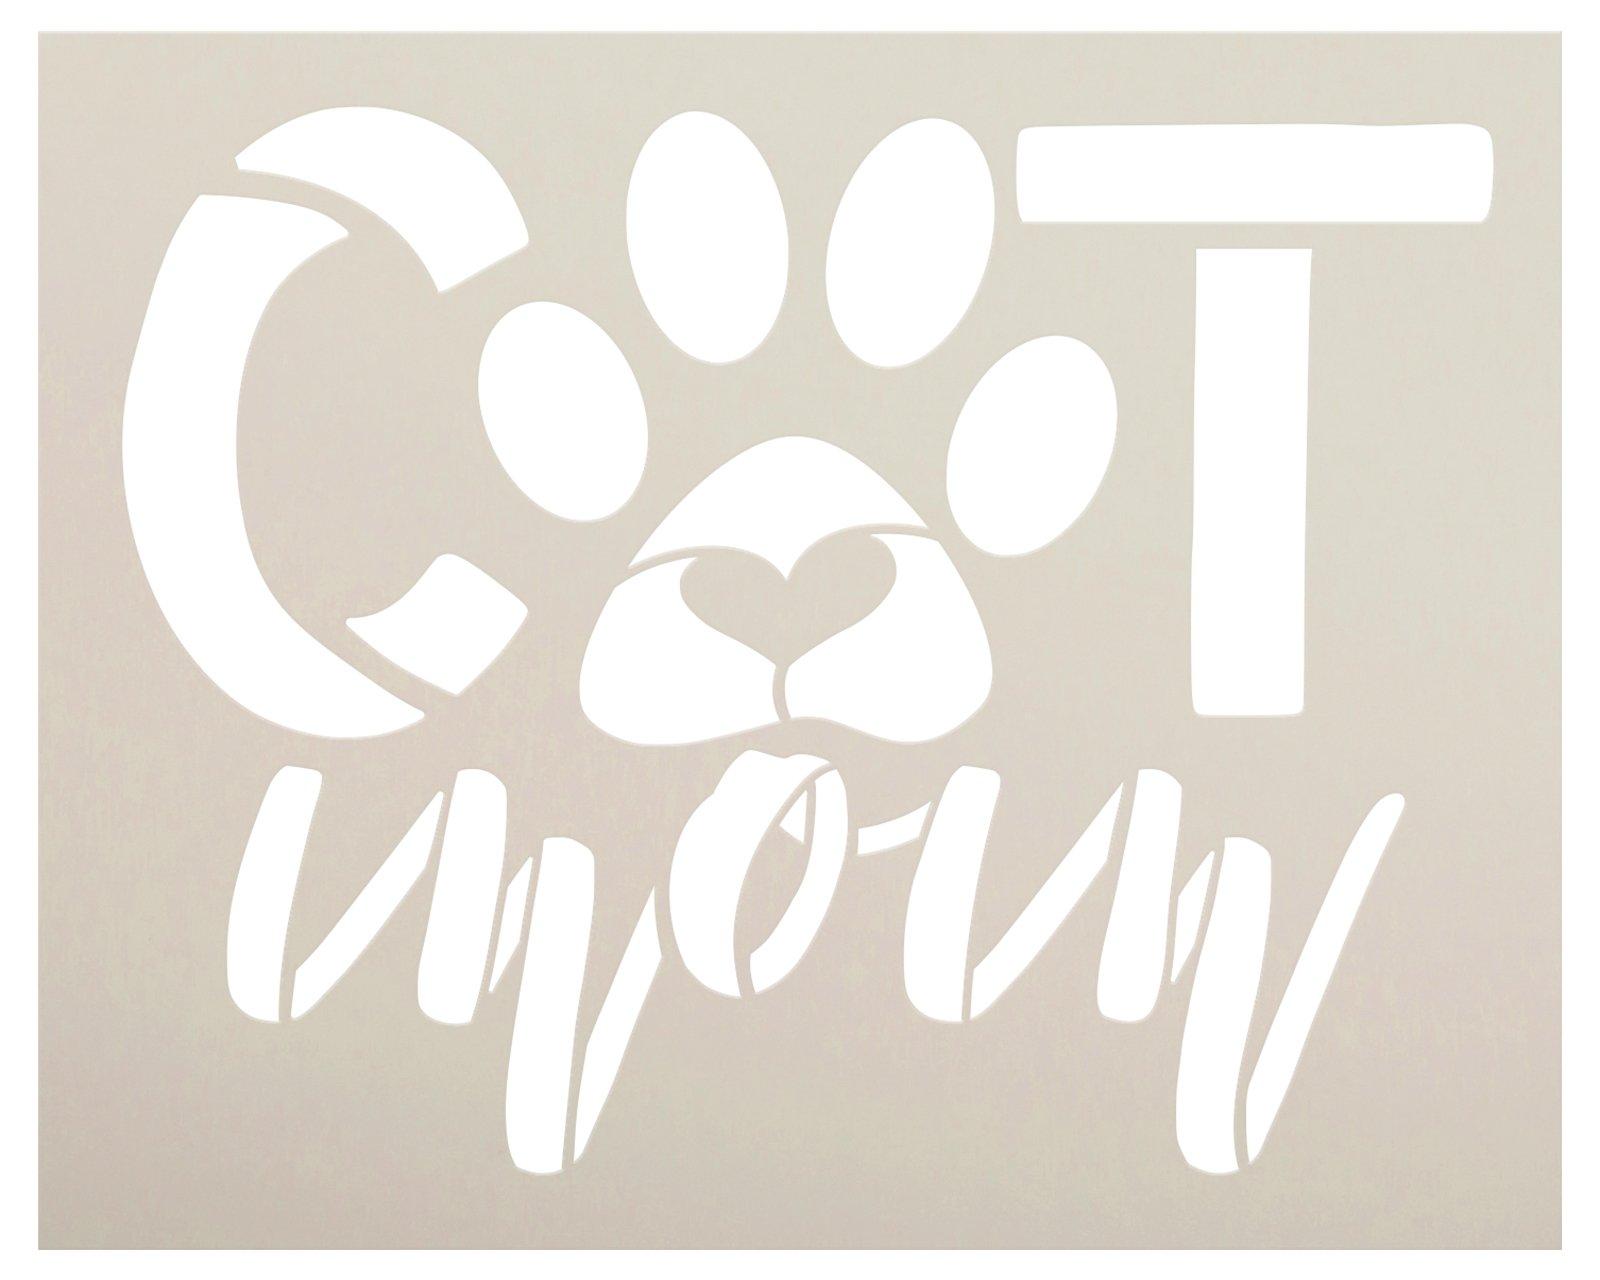 Cat Mom Pawprint Stencil by StudioR12   DIY Pet Lover Home Decor   Craft & Paint Cursive Script Wood Sign   Reusable Mylar Template   Select Size